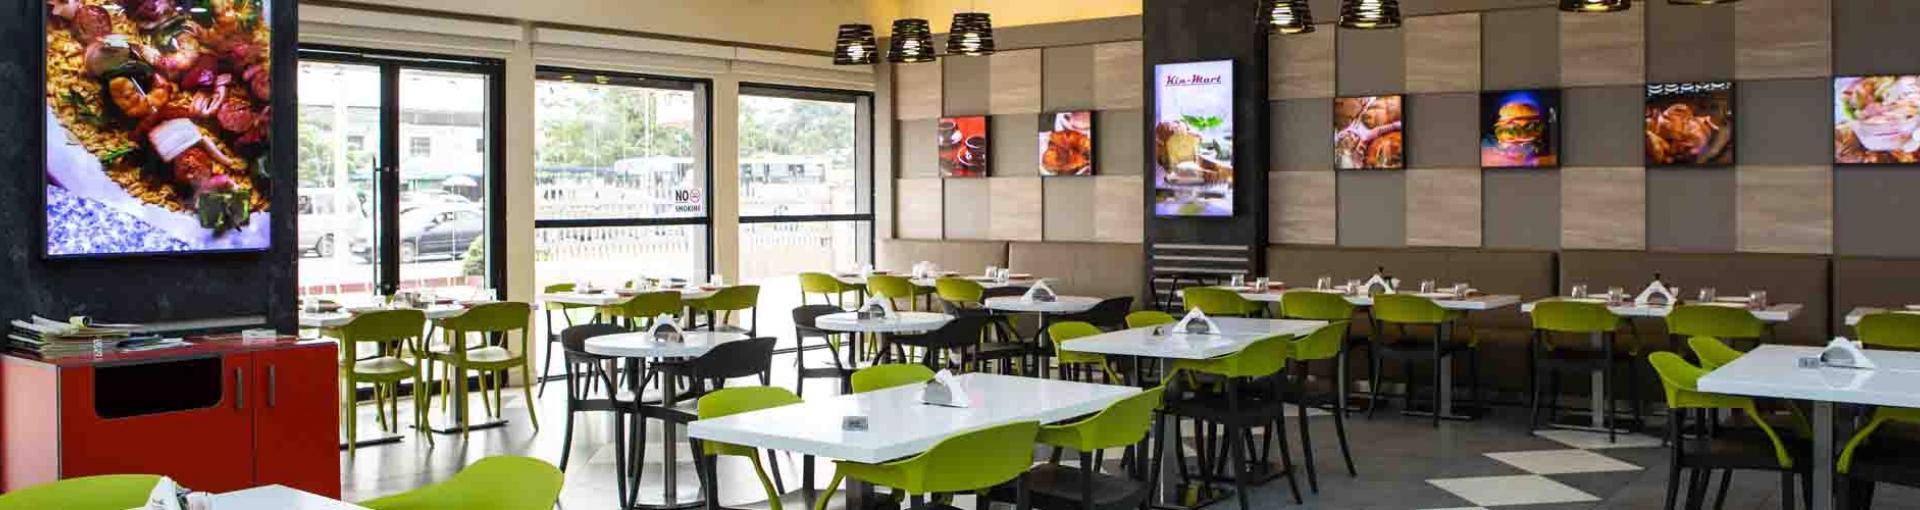 kin mart restaurant